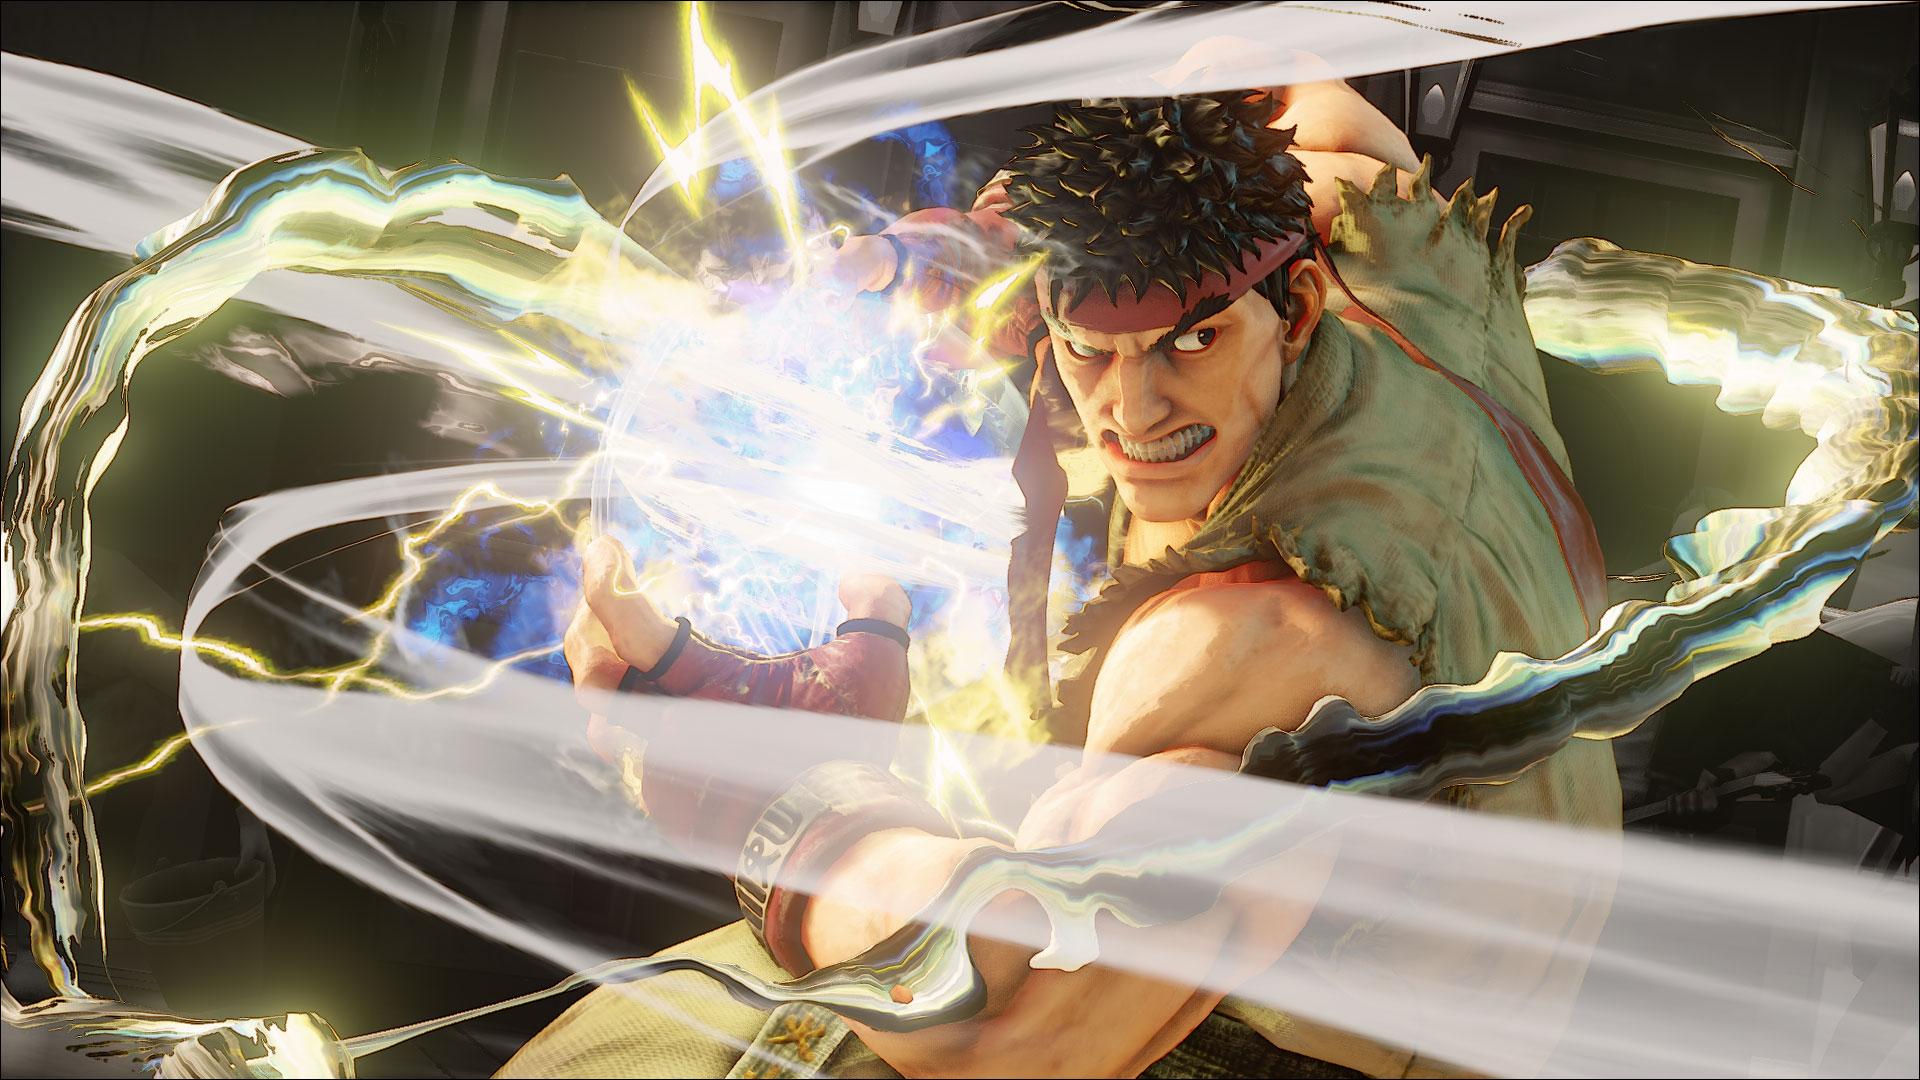 CAPCOMu unikla komunikace o hře Street Fighter VI